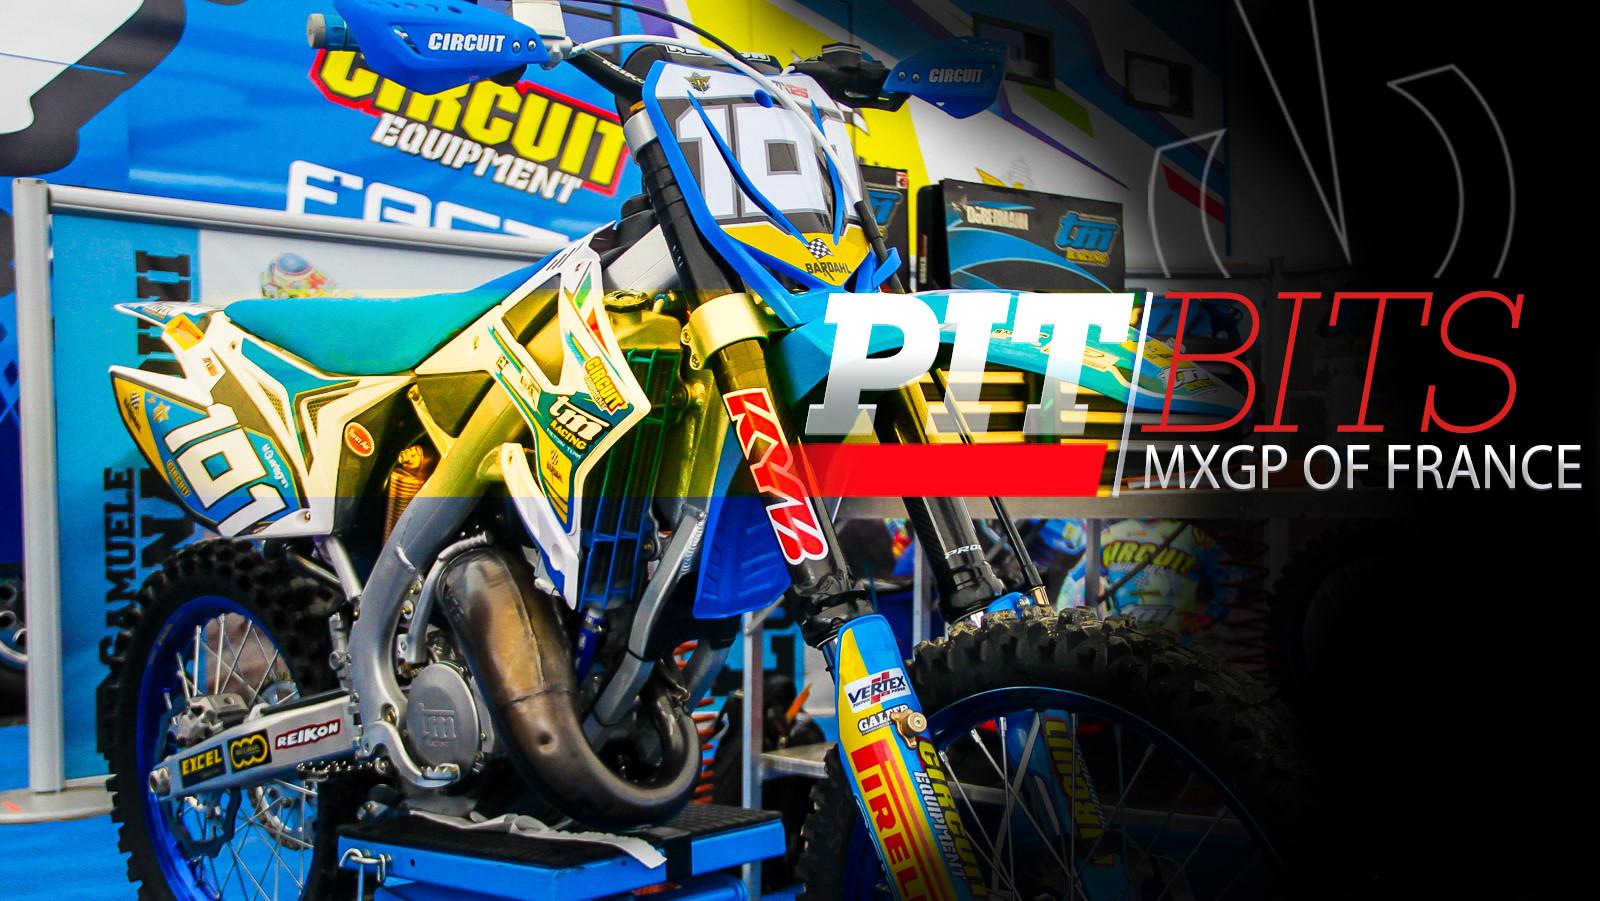 Pit Bits: MXGP of France - TM 125 - Vital MX Pit Bits: 2017 MXGP of France - Motocross Pictures - Vital MX